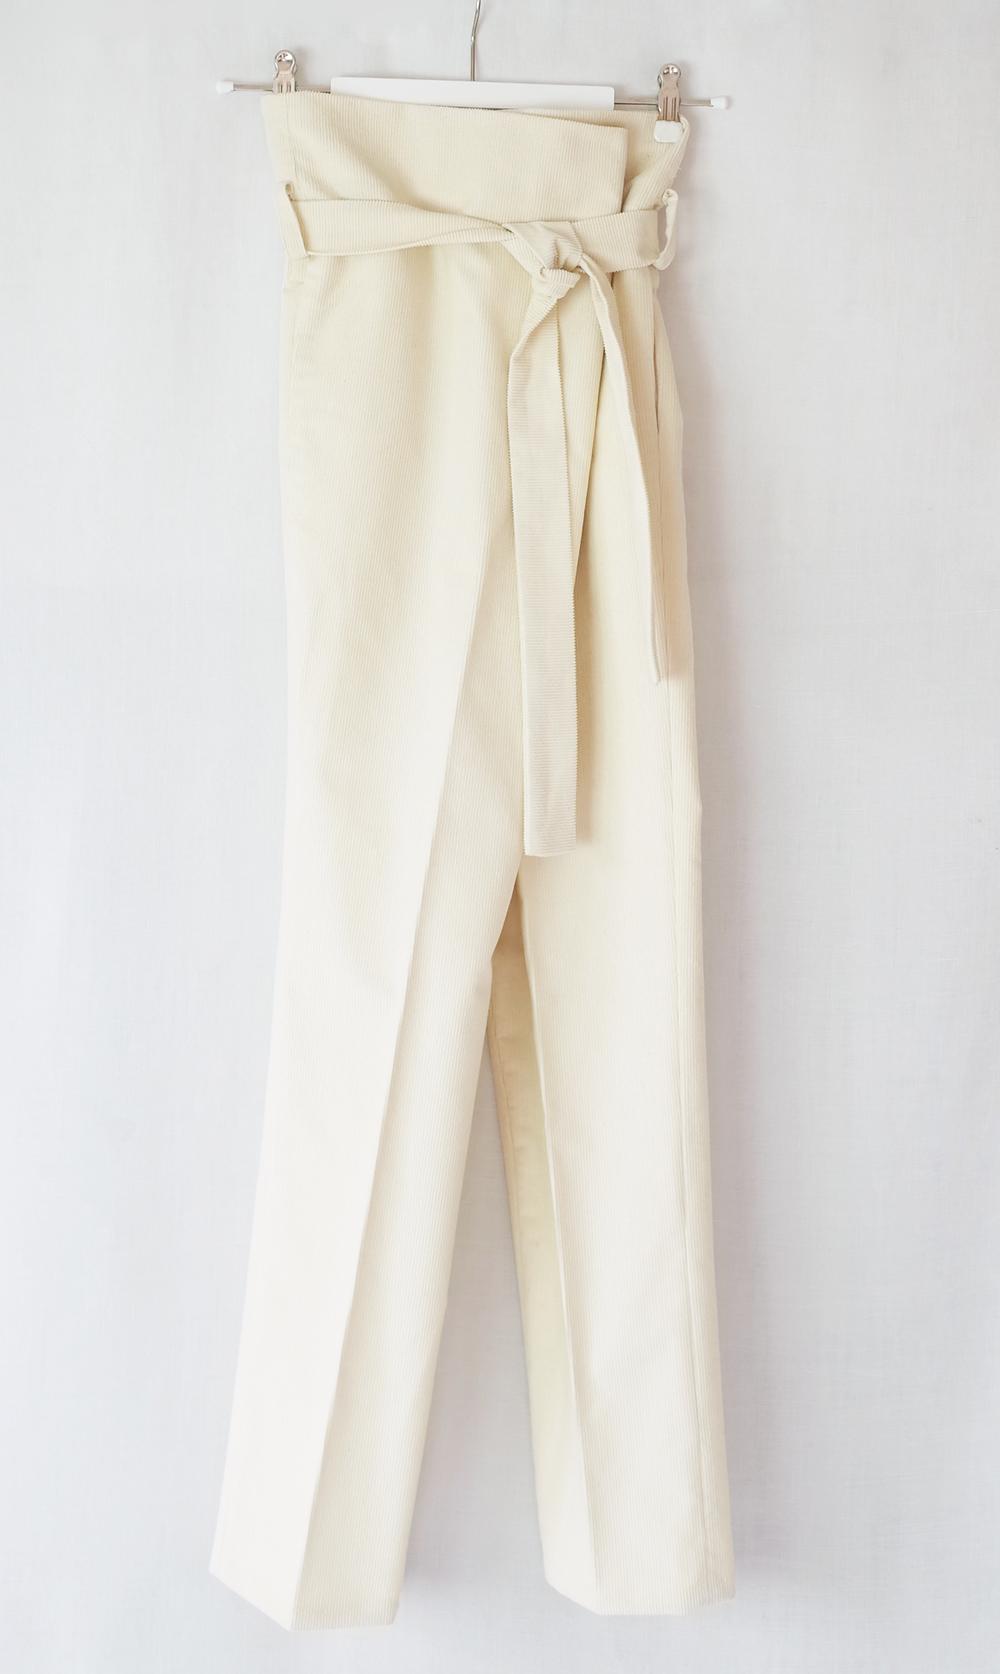 color:light beige  material: 100% cotton, manchester